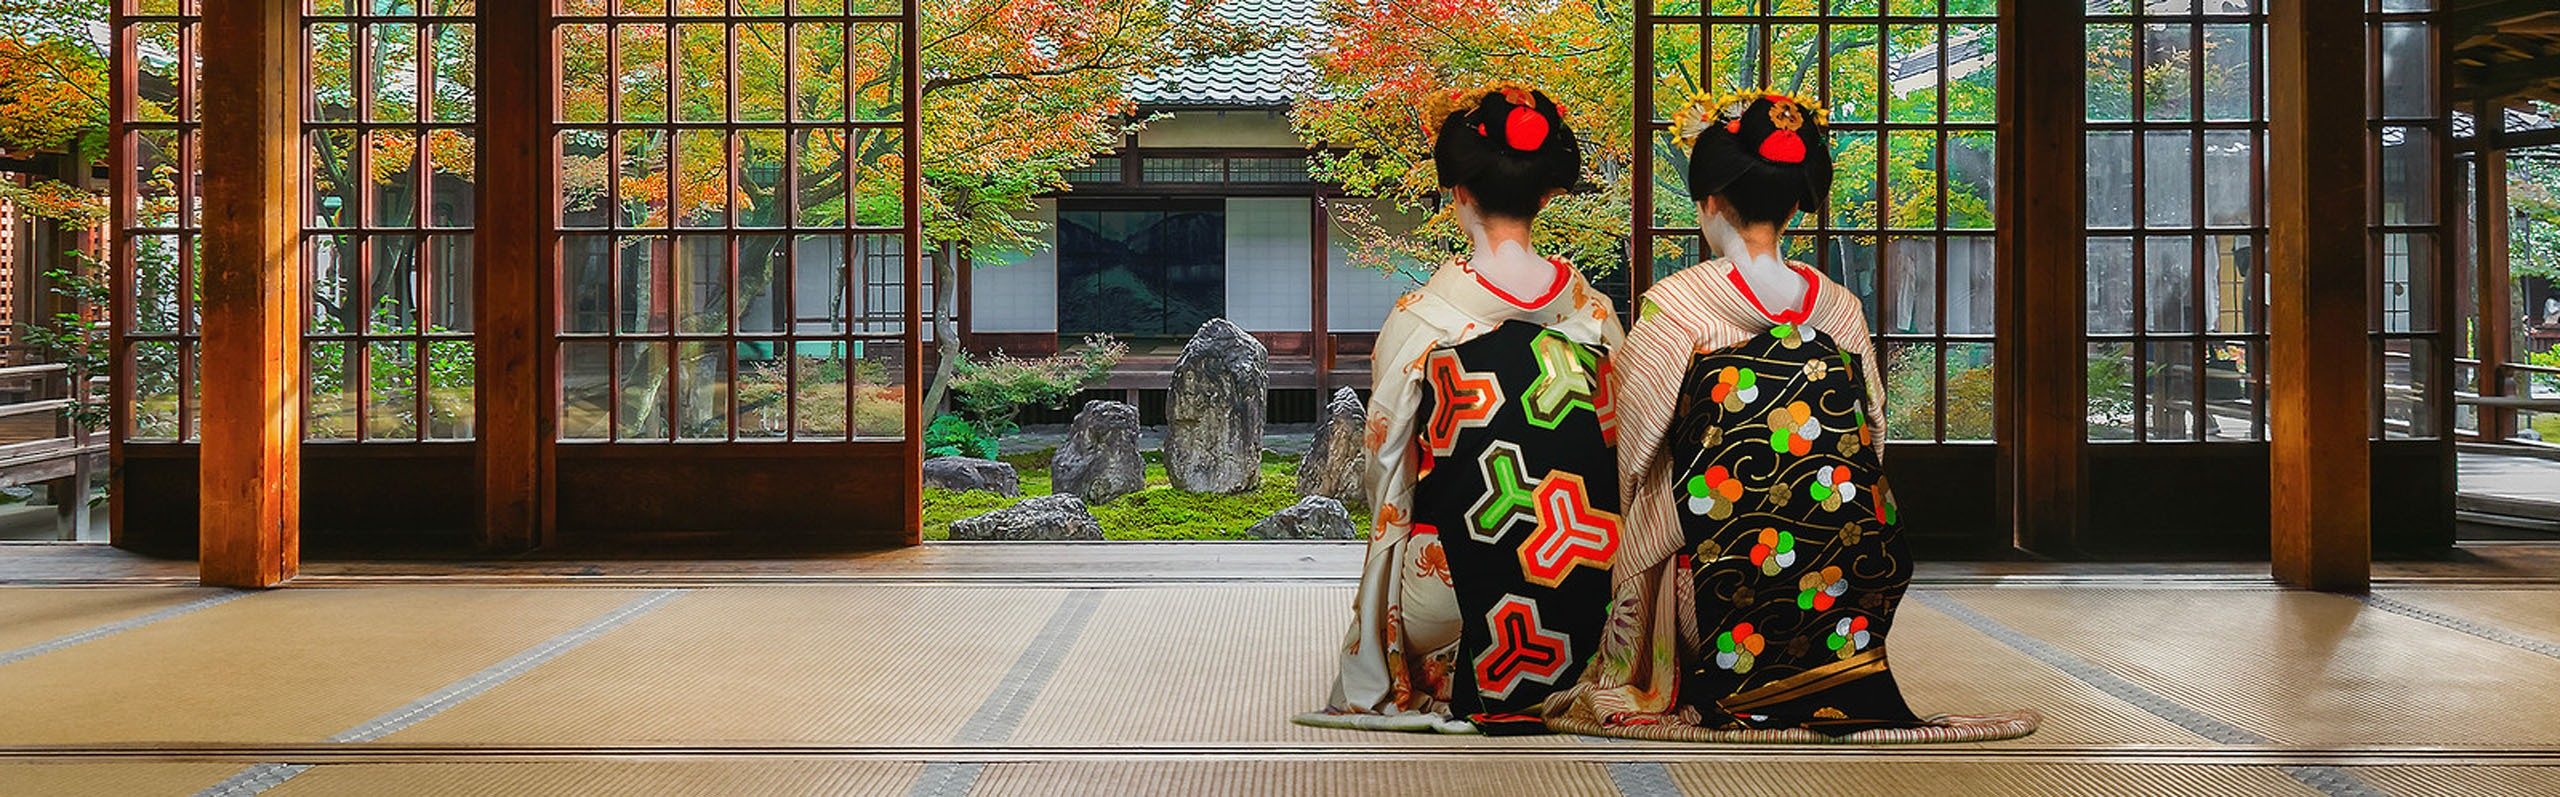 Garden Guide in Japan